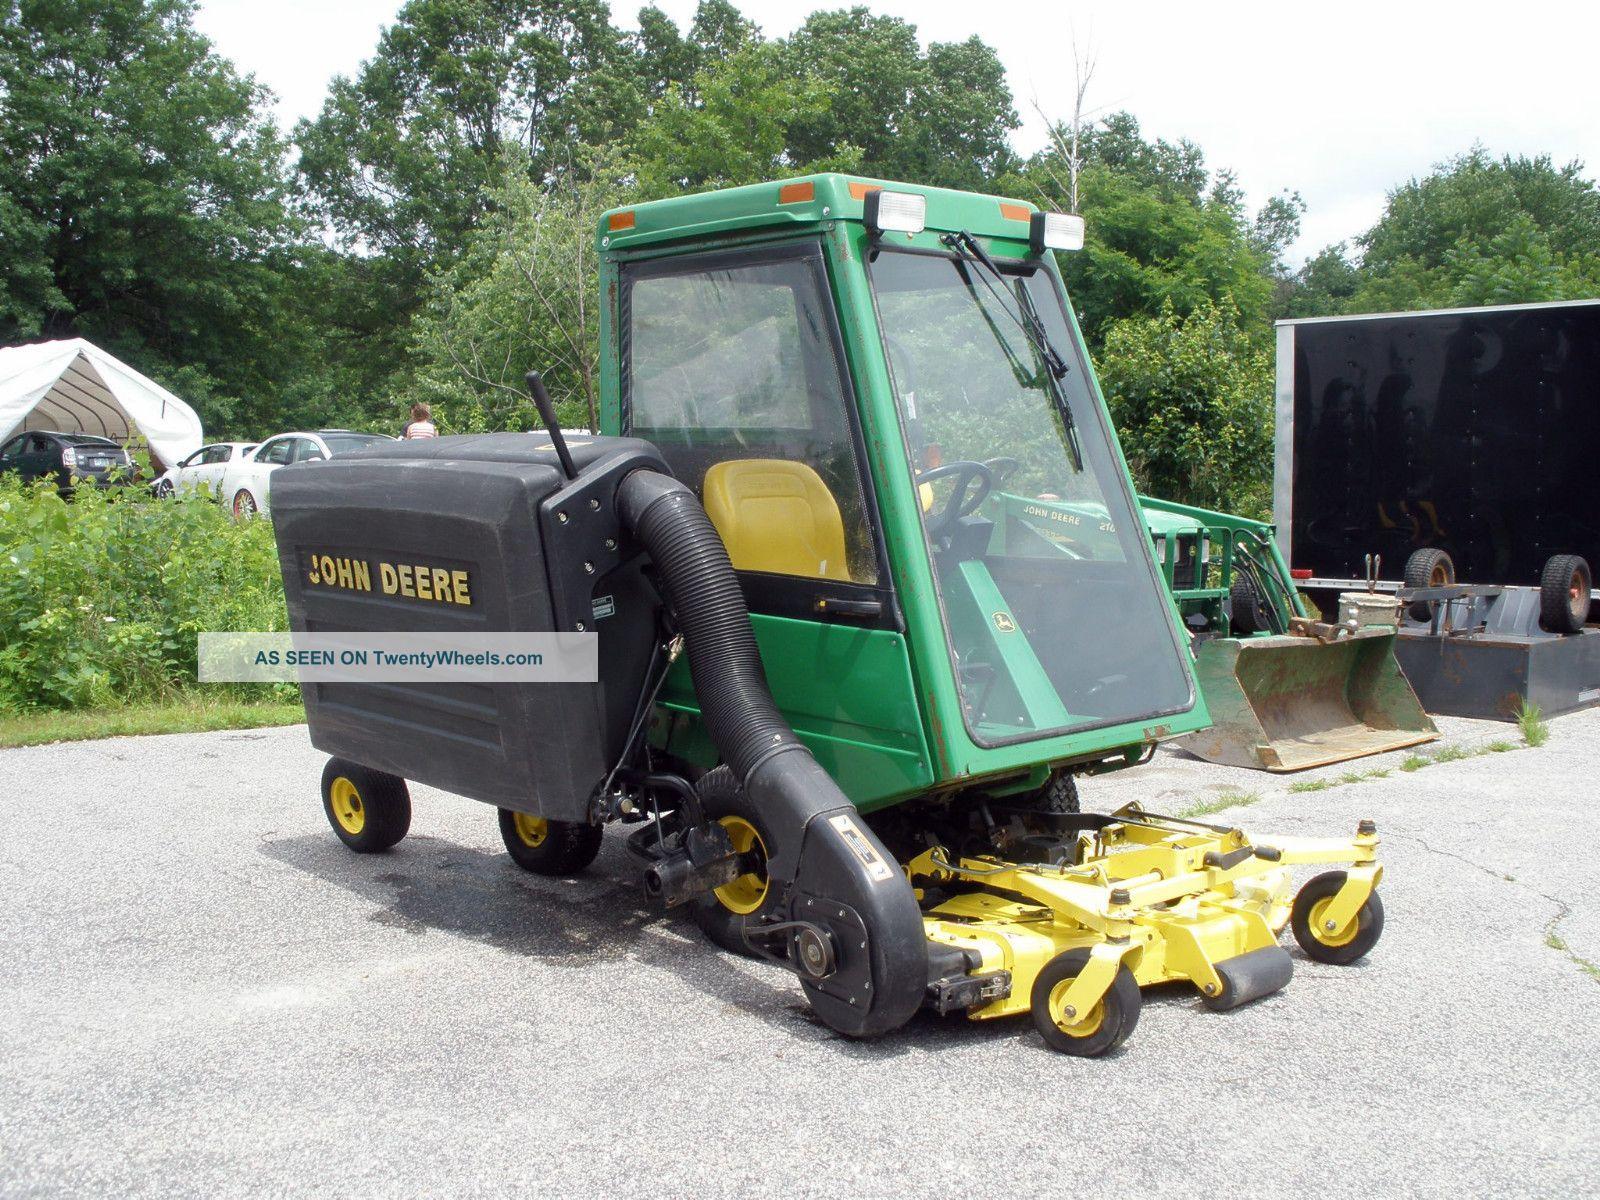 John Deere F735 Diesel Front Mount Tractor W/ Mower, Mcs, Cab & Snow Blower